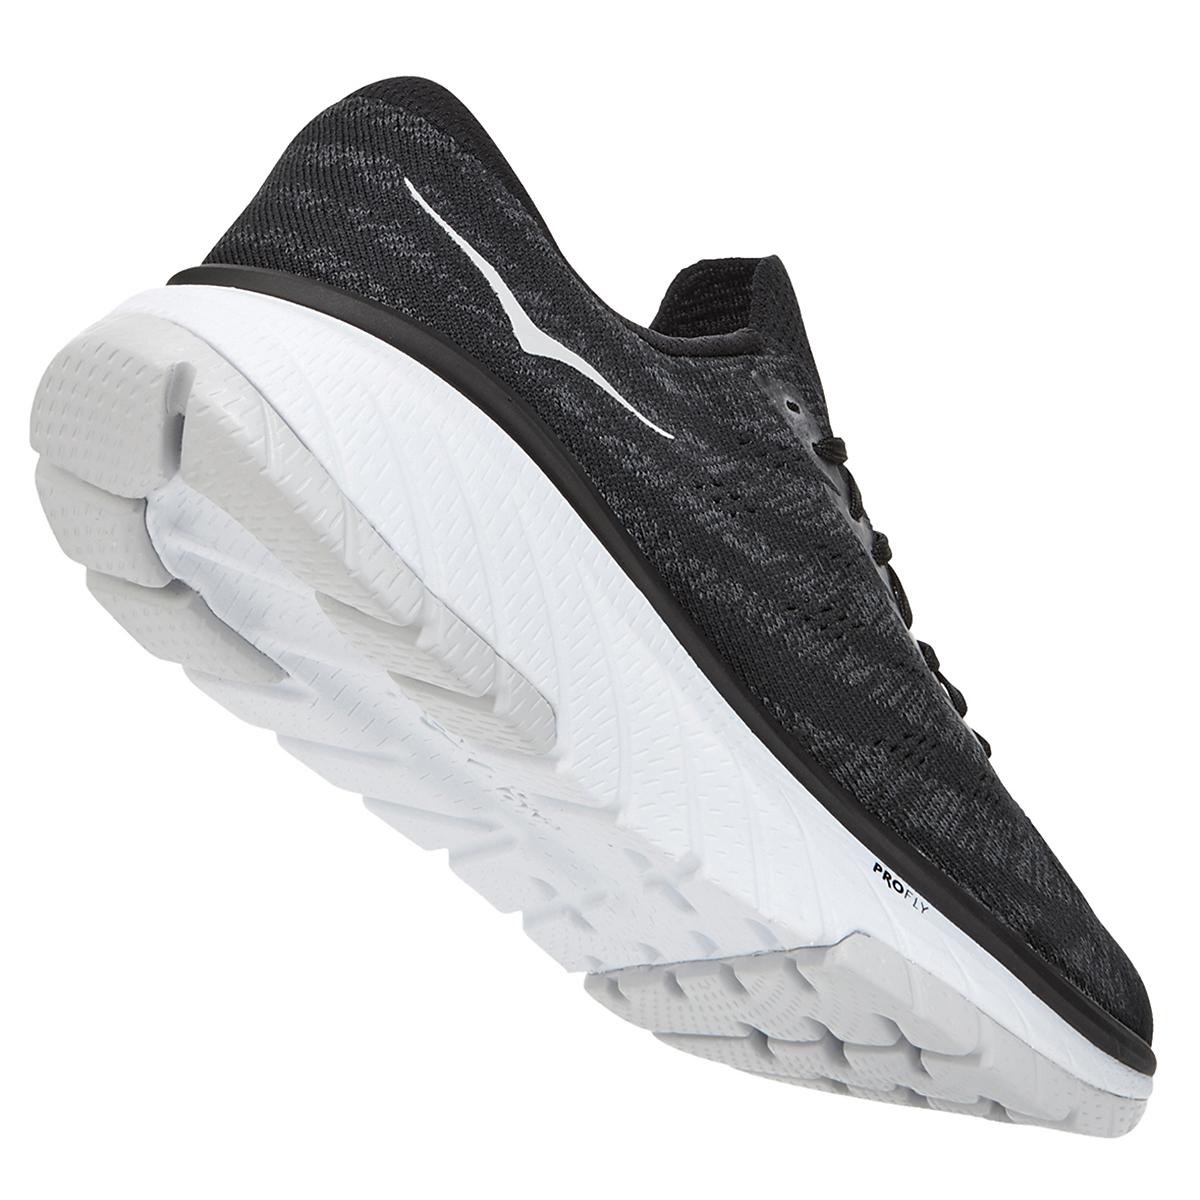 Men's Hoka One One Cavu 3 Running Shoe - Color: Black/White - Size: 7 - Width: Regular, Black/White, large, image 4